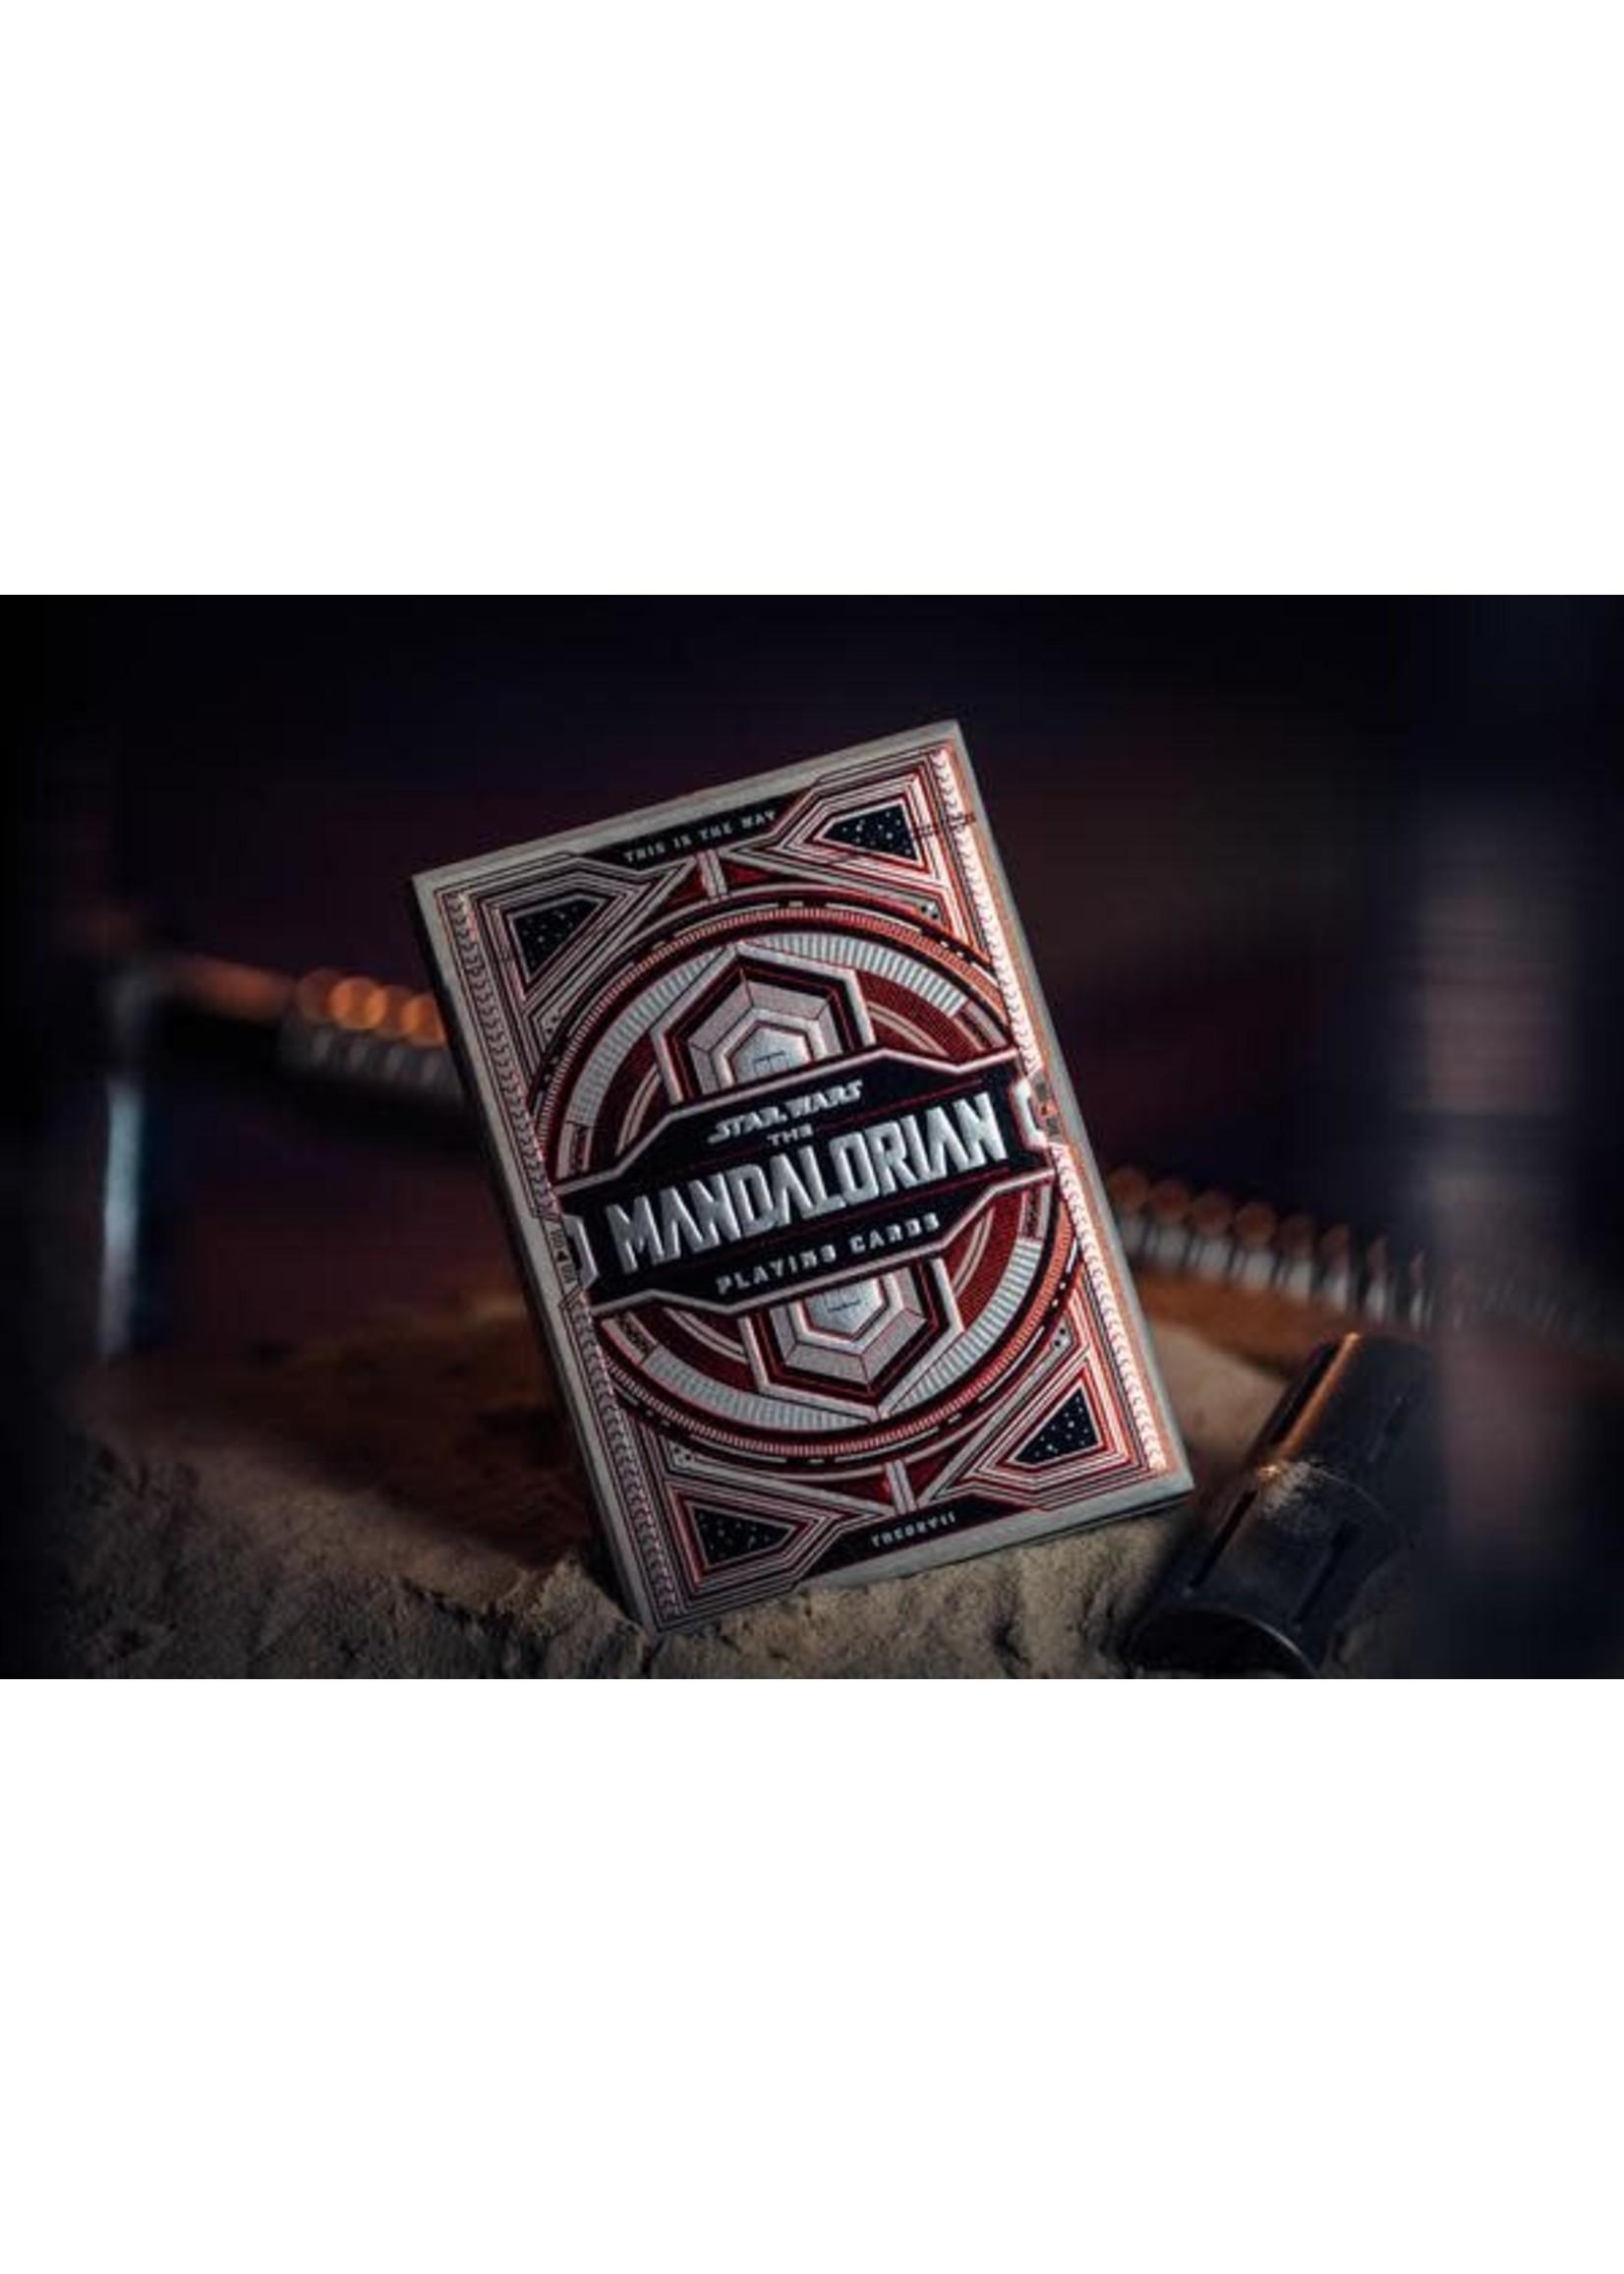 Theory 11 Premium Playing Cards Star Wars Mandalorian